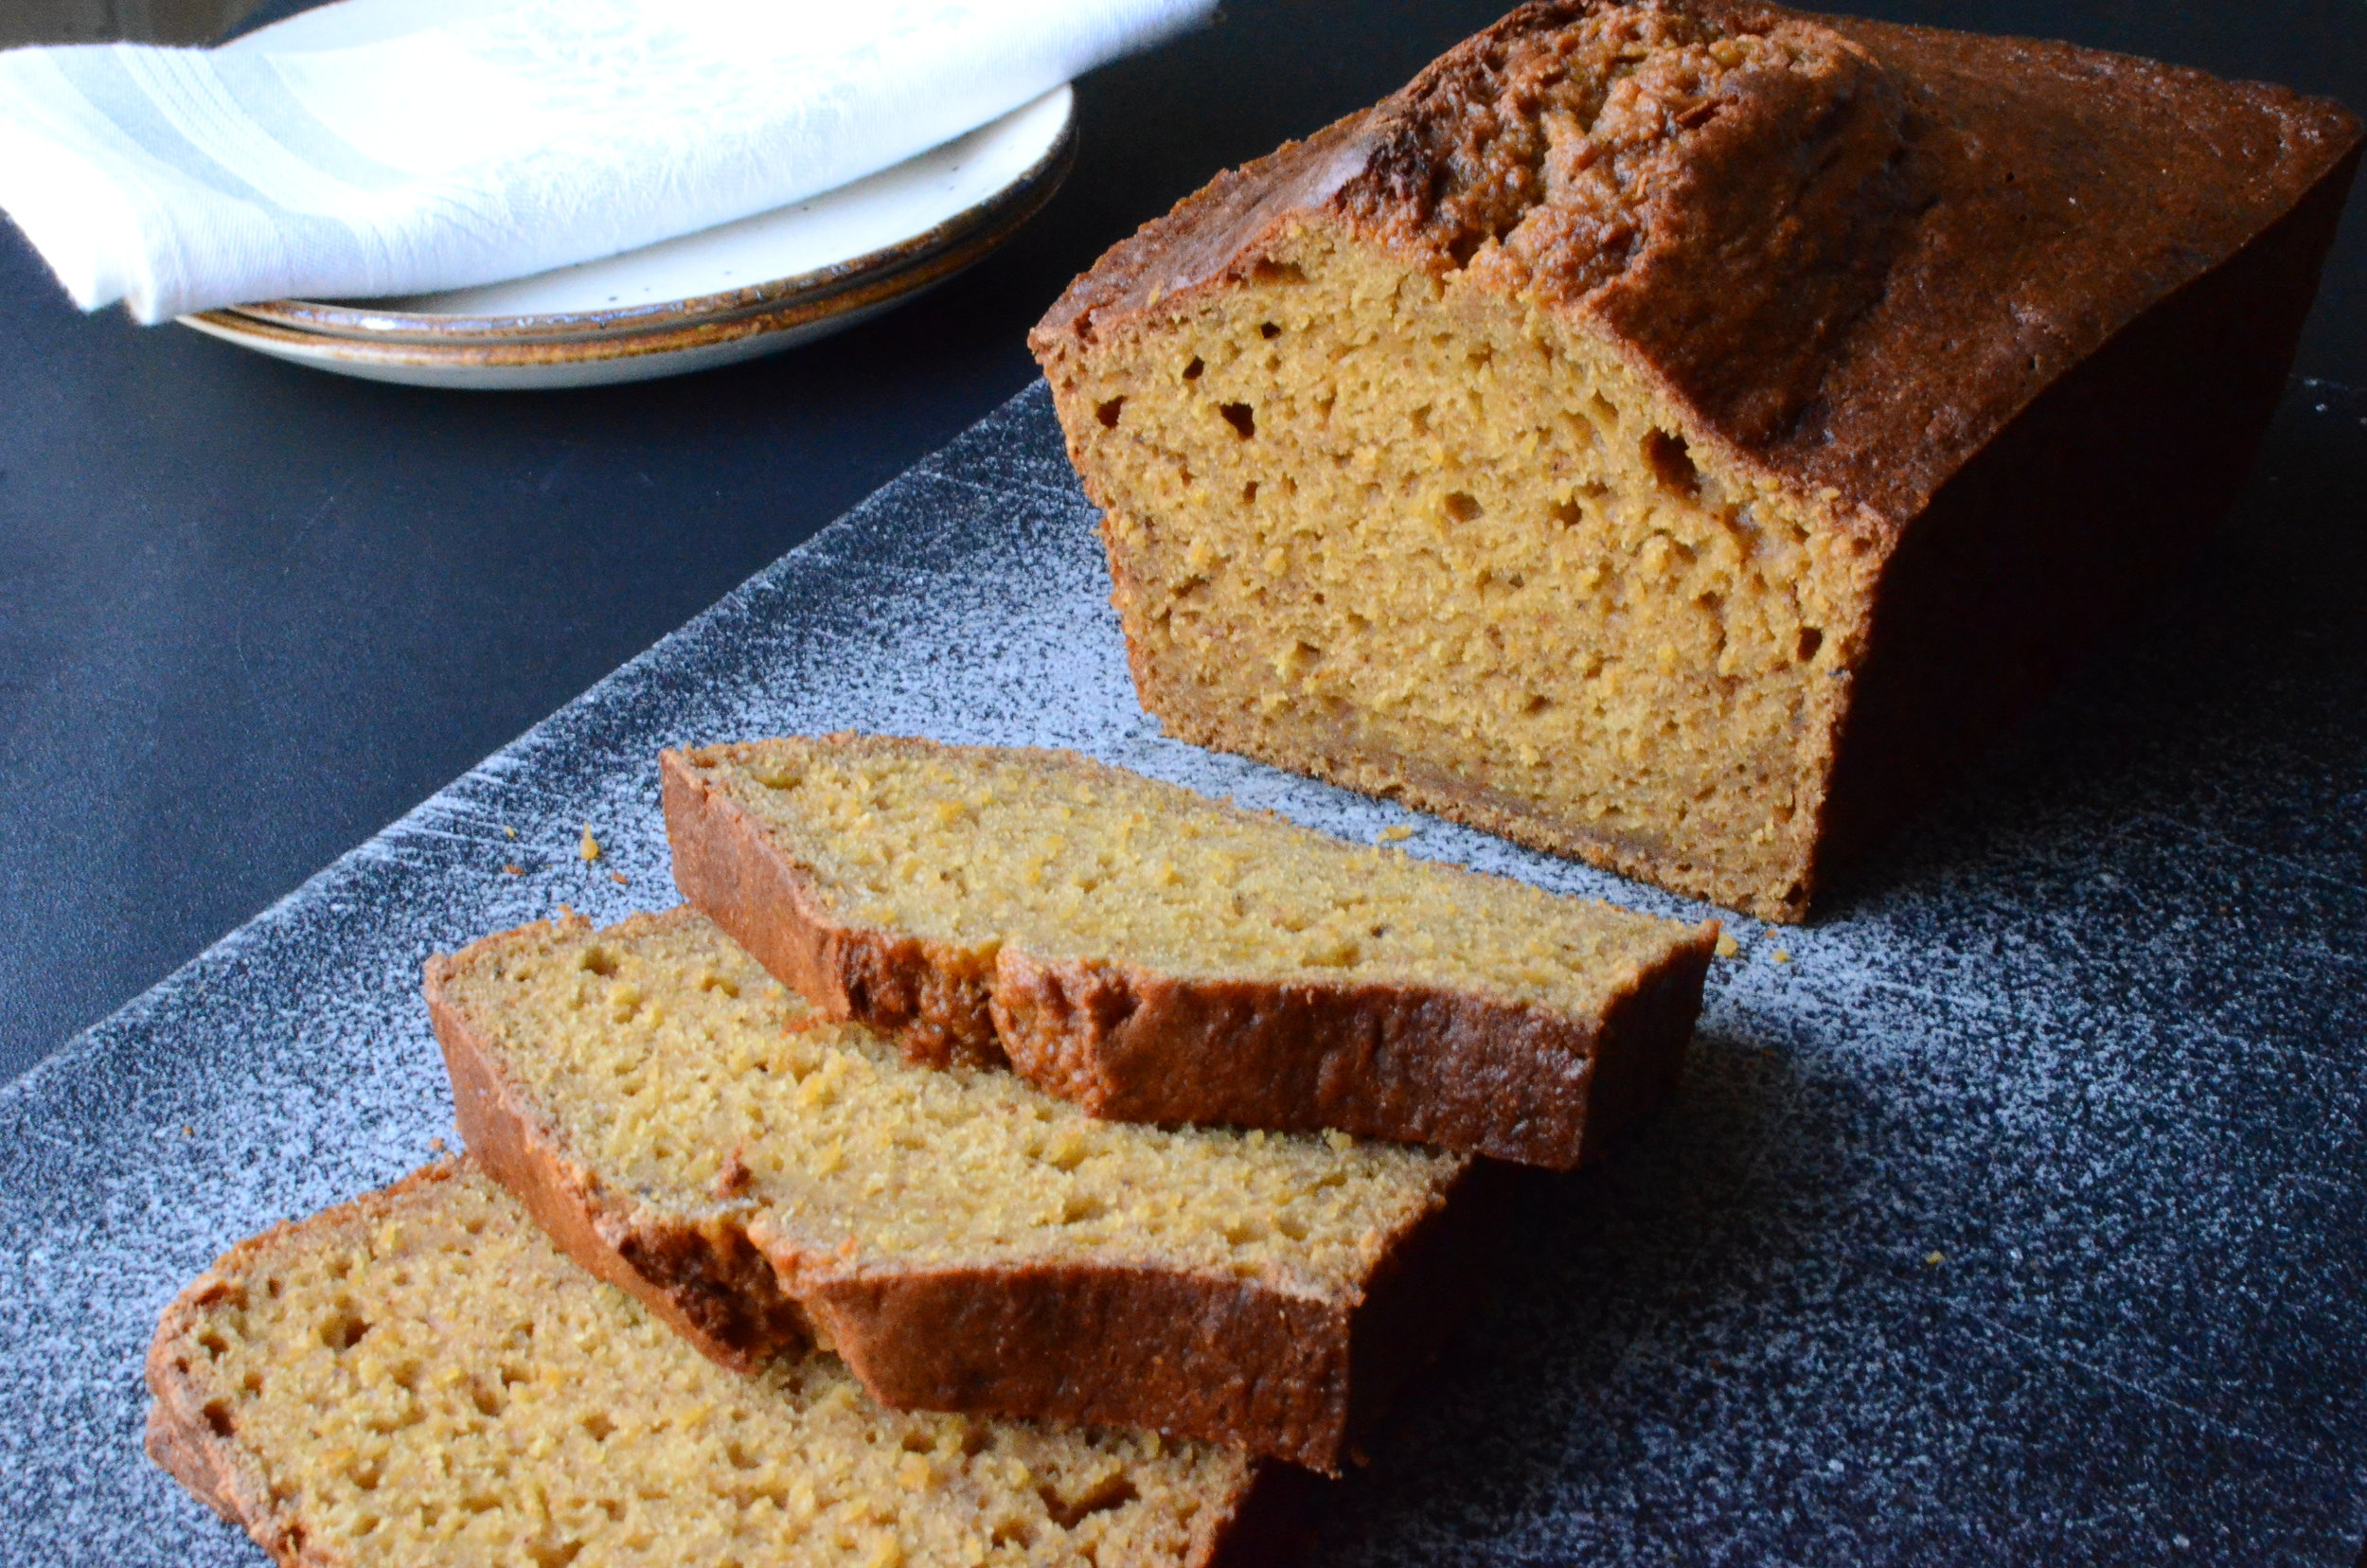 pumpkin spice bread recipe. how to make pumpkin spice bread. how to make pumpkin bread. how to make pumpkin puree. fall quick bread recipe. autumn quick bread recipe.